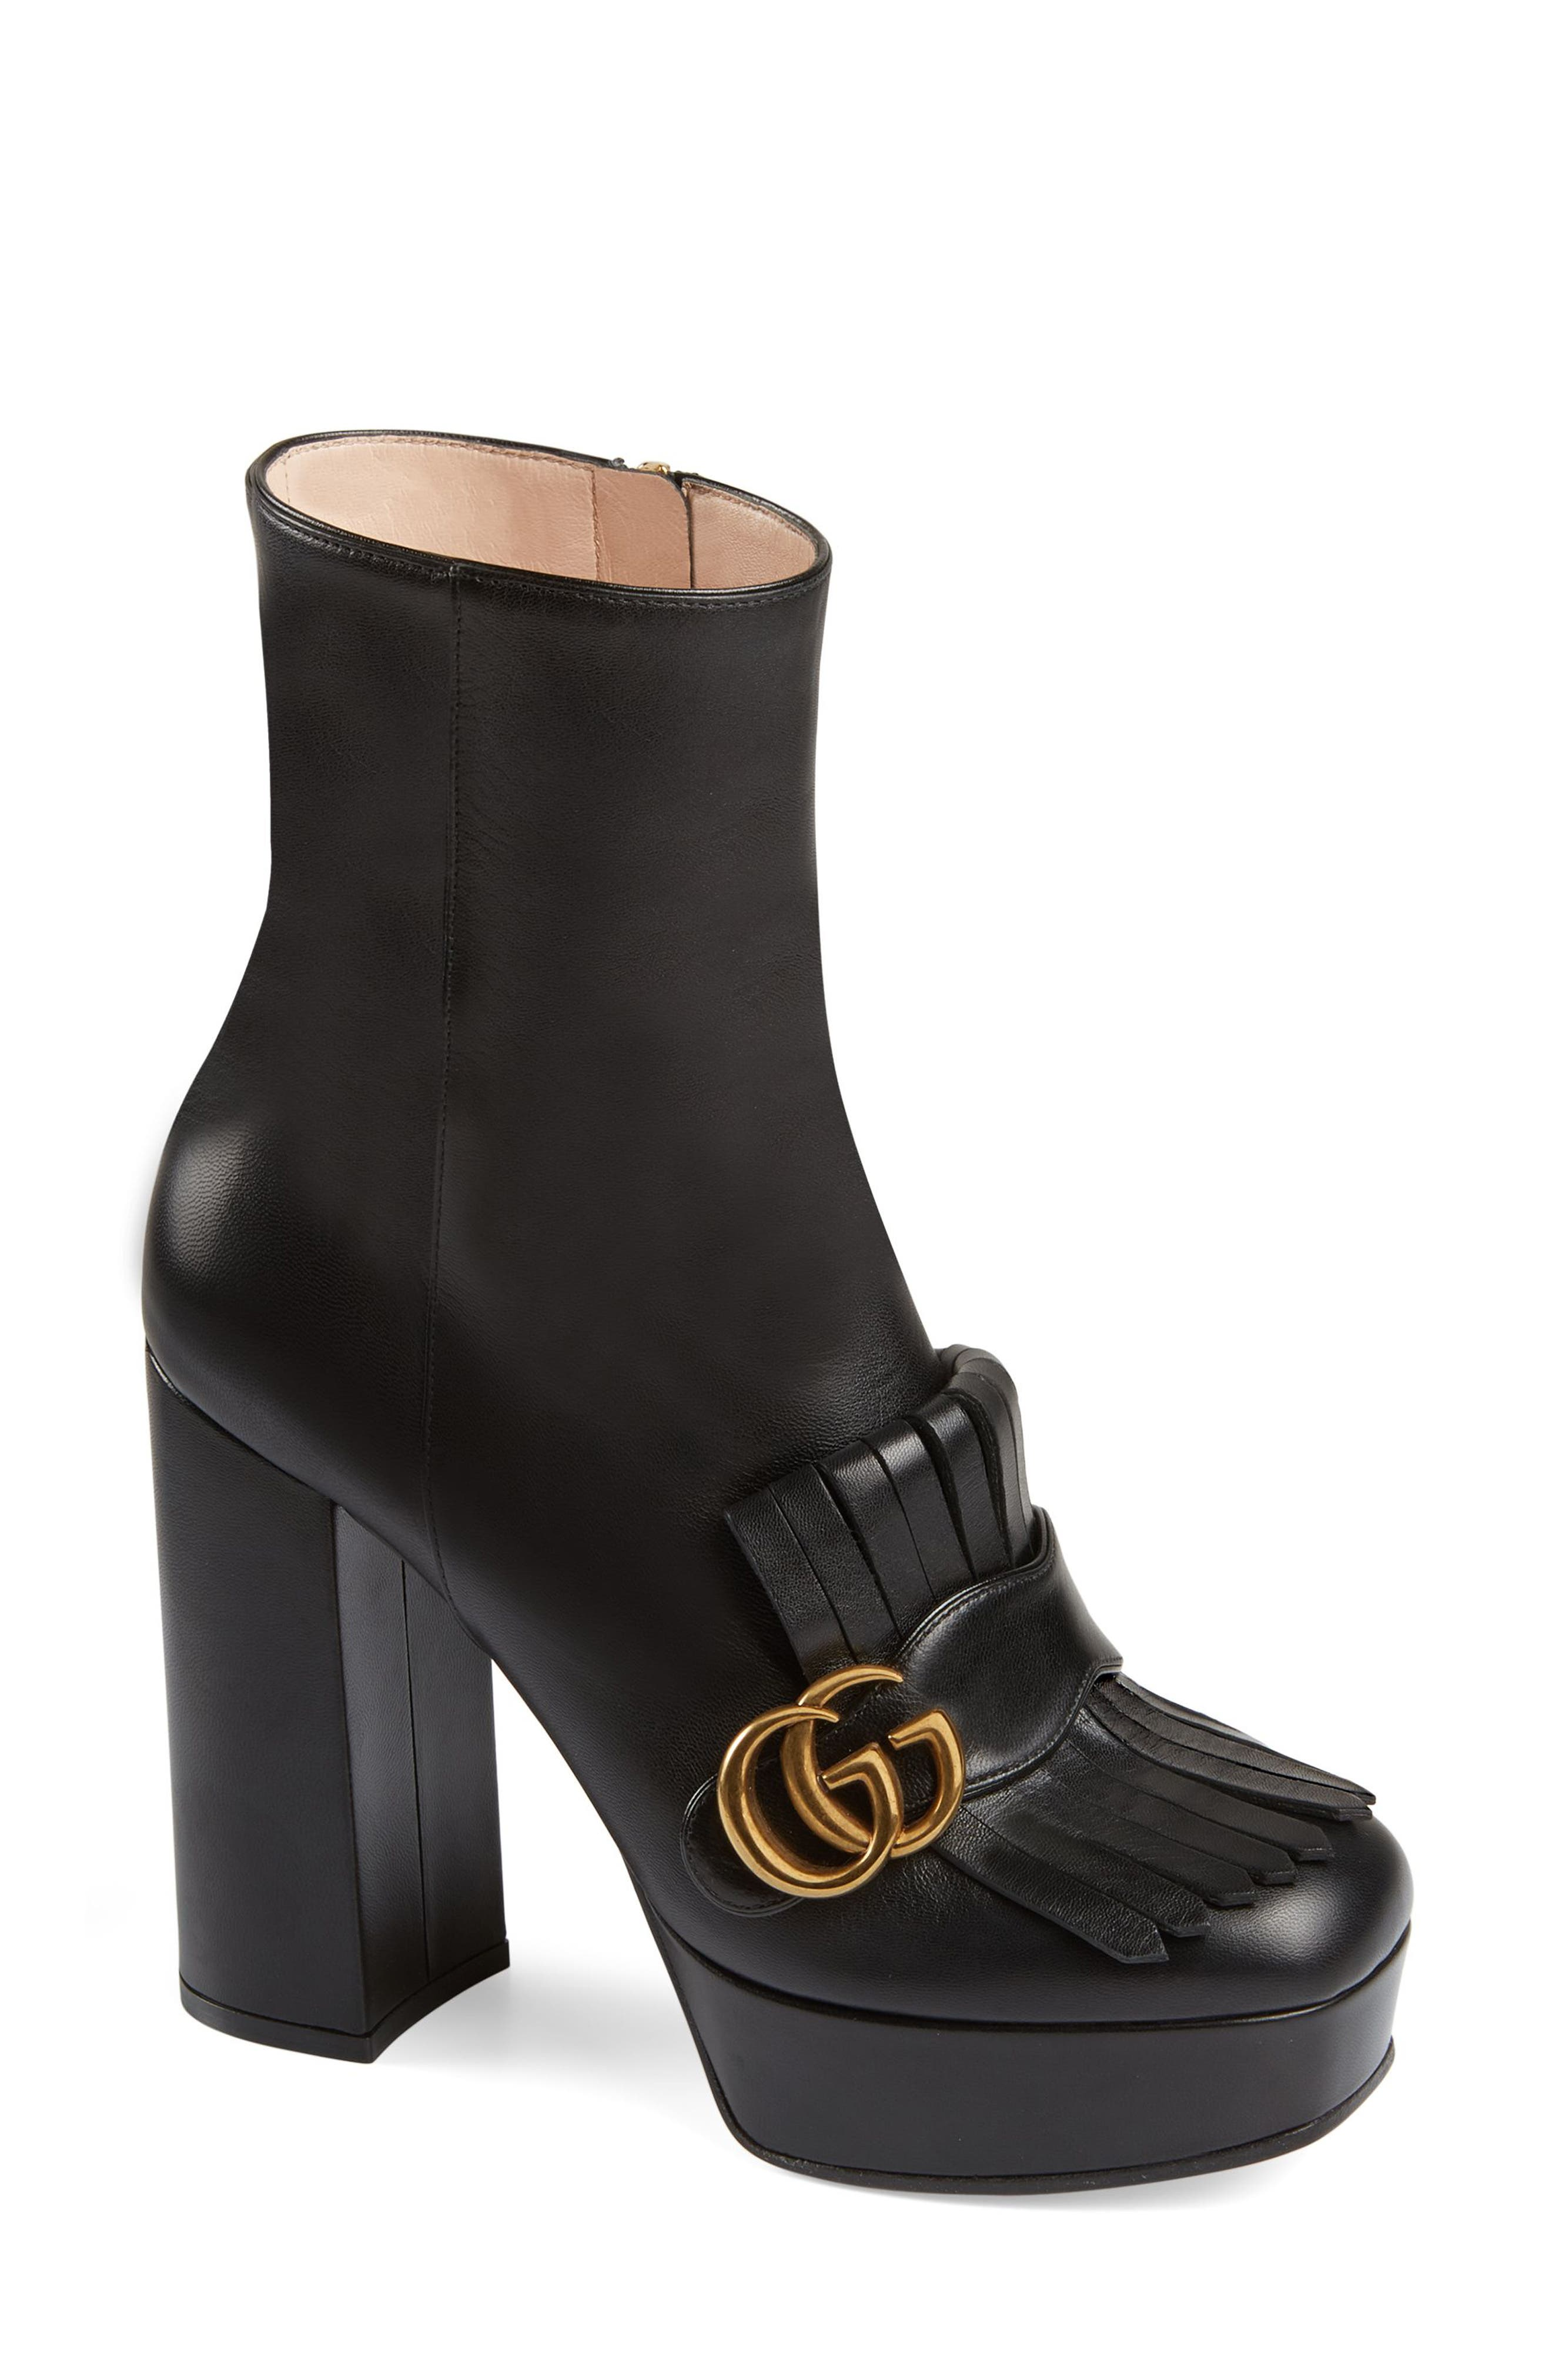 Gucci Gg Marmont Platform Bootie - Black